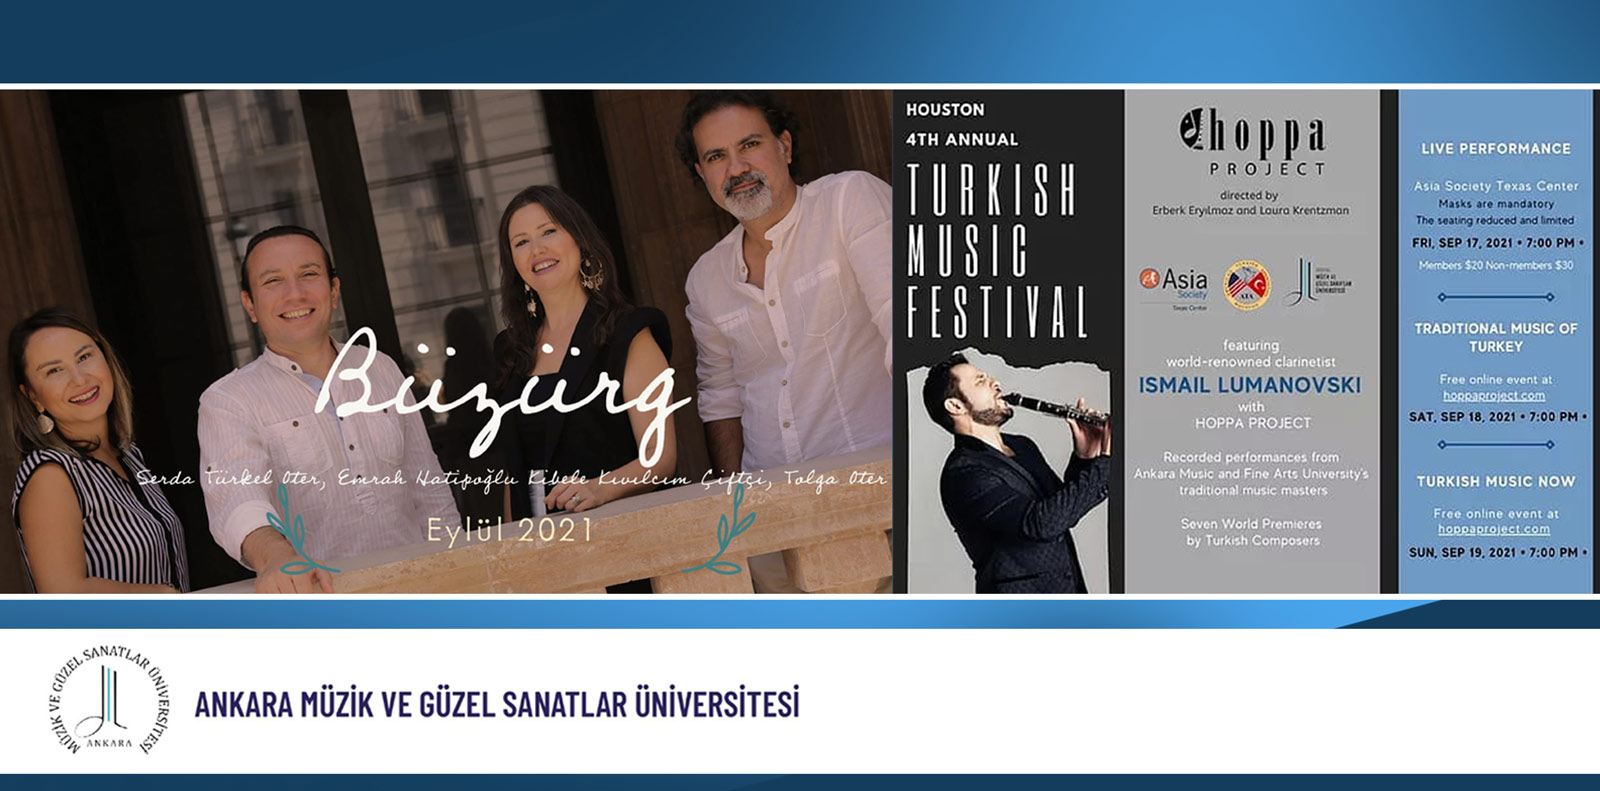 Traditional Music of Turkey Slide